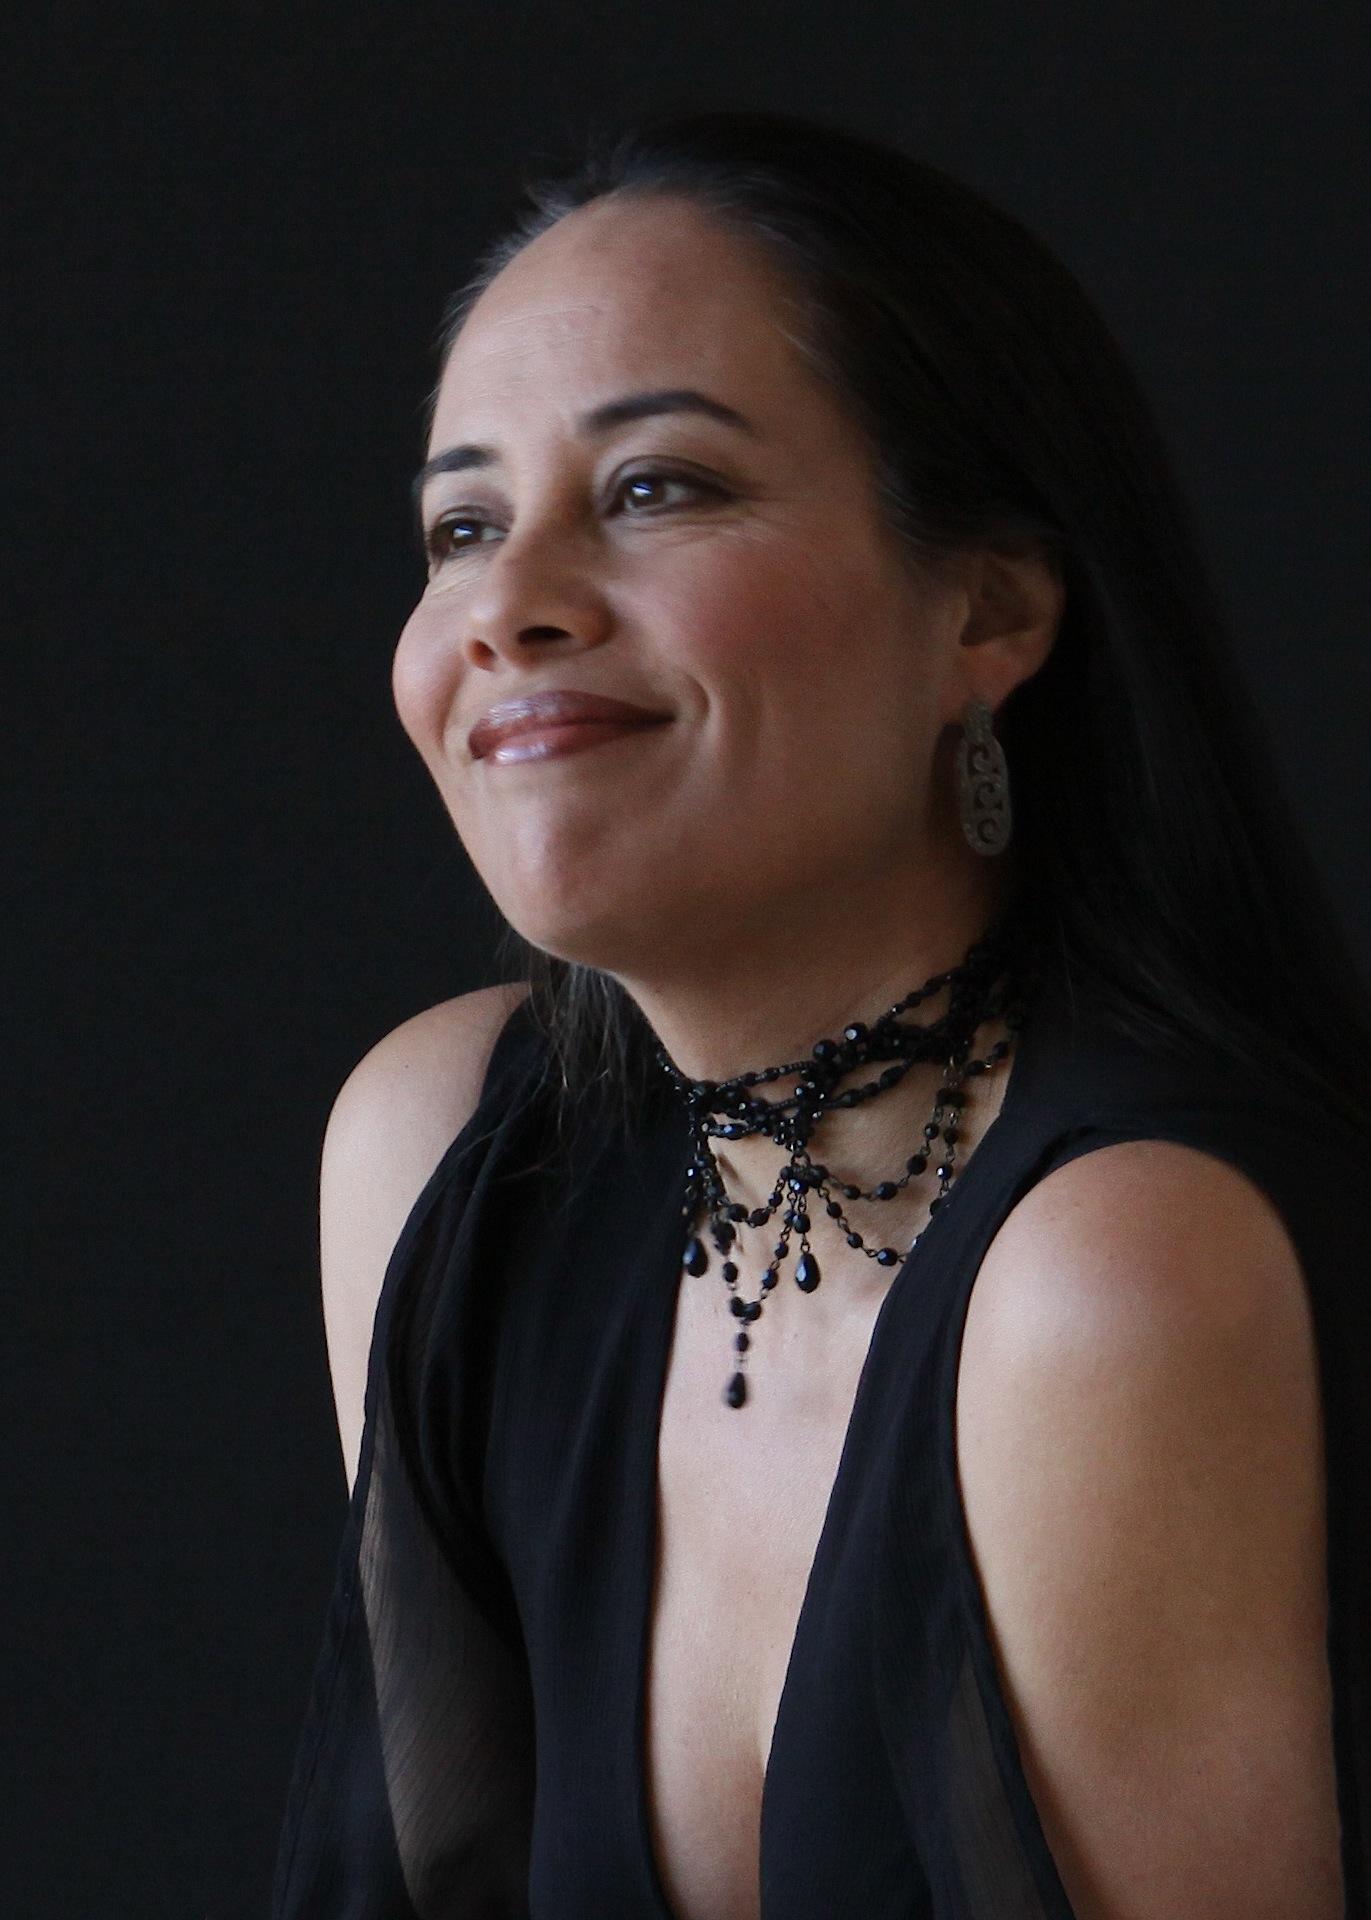 Lisa LaCroix